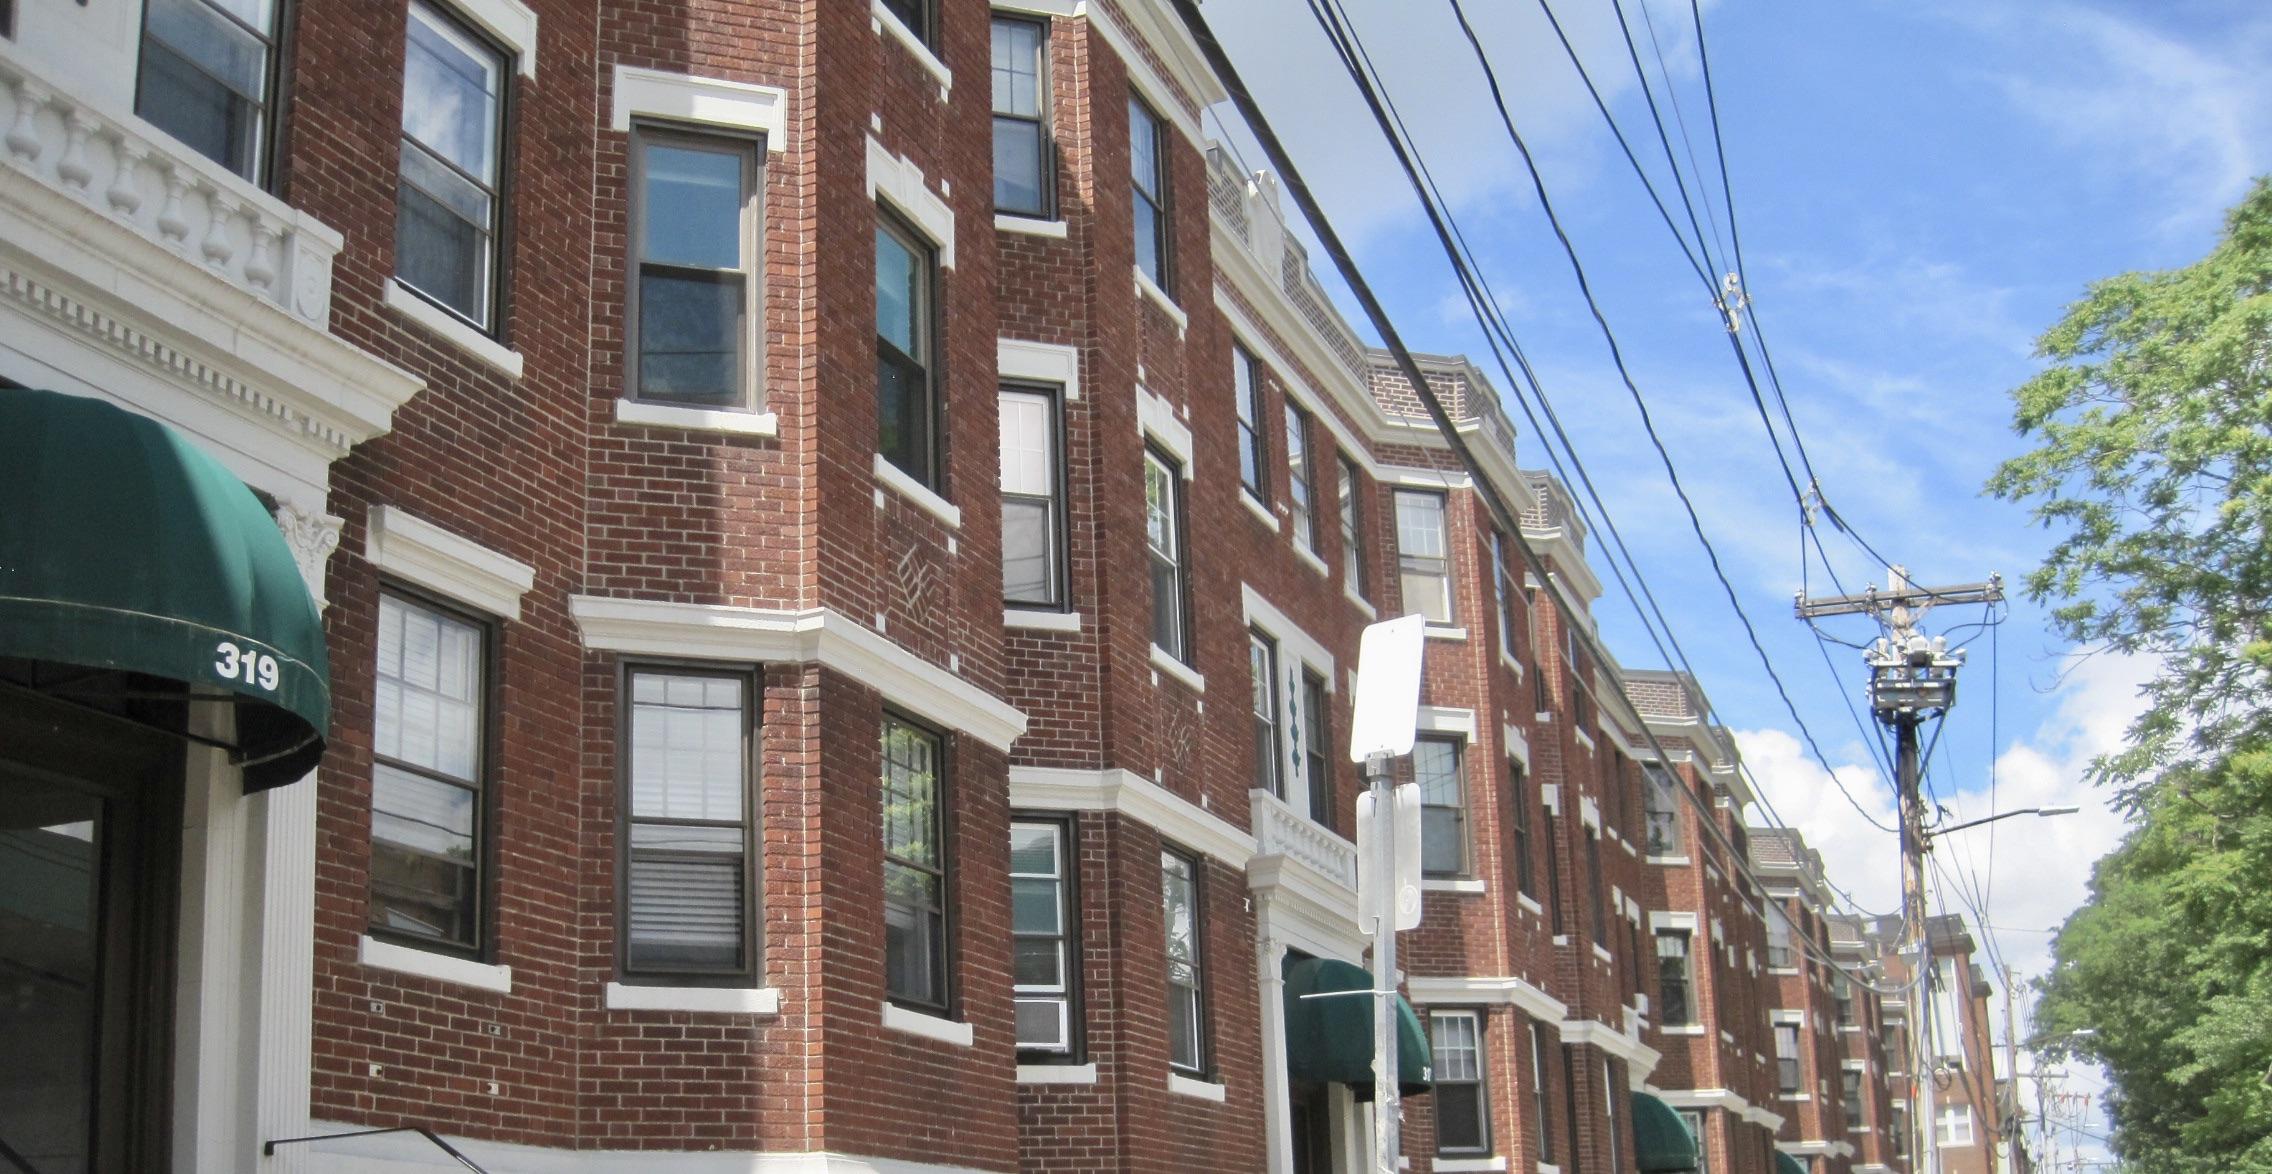 Apartments on Allston Street in Allston, MA